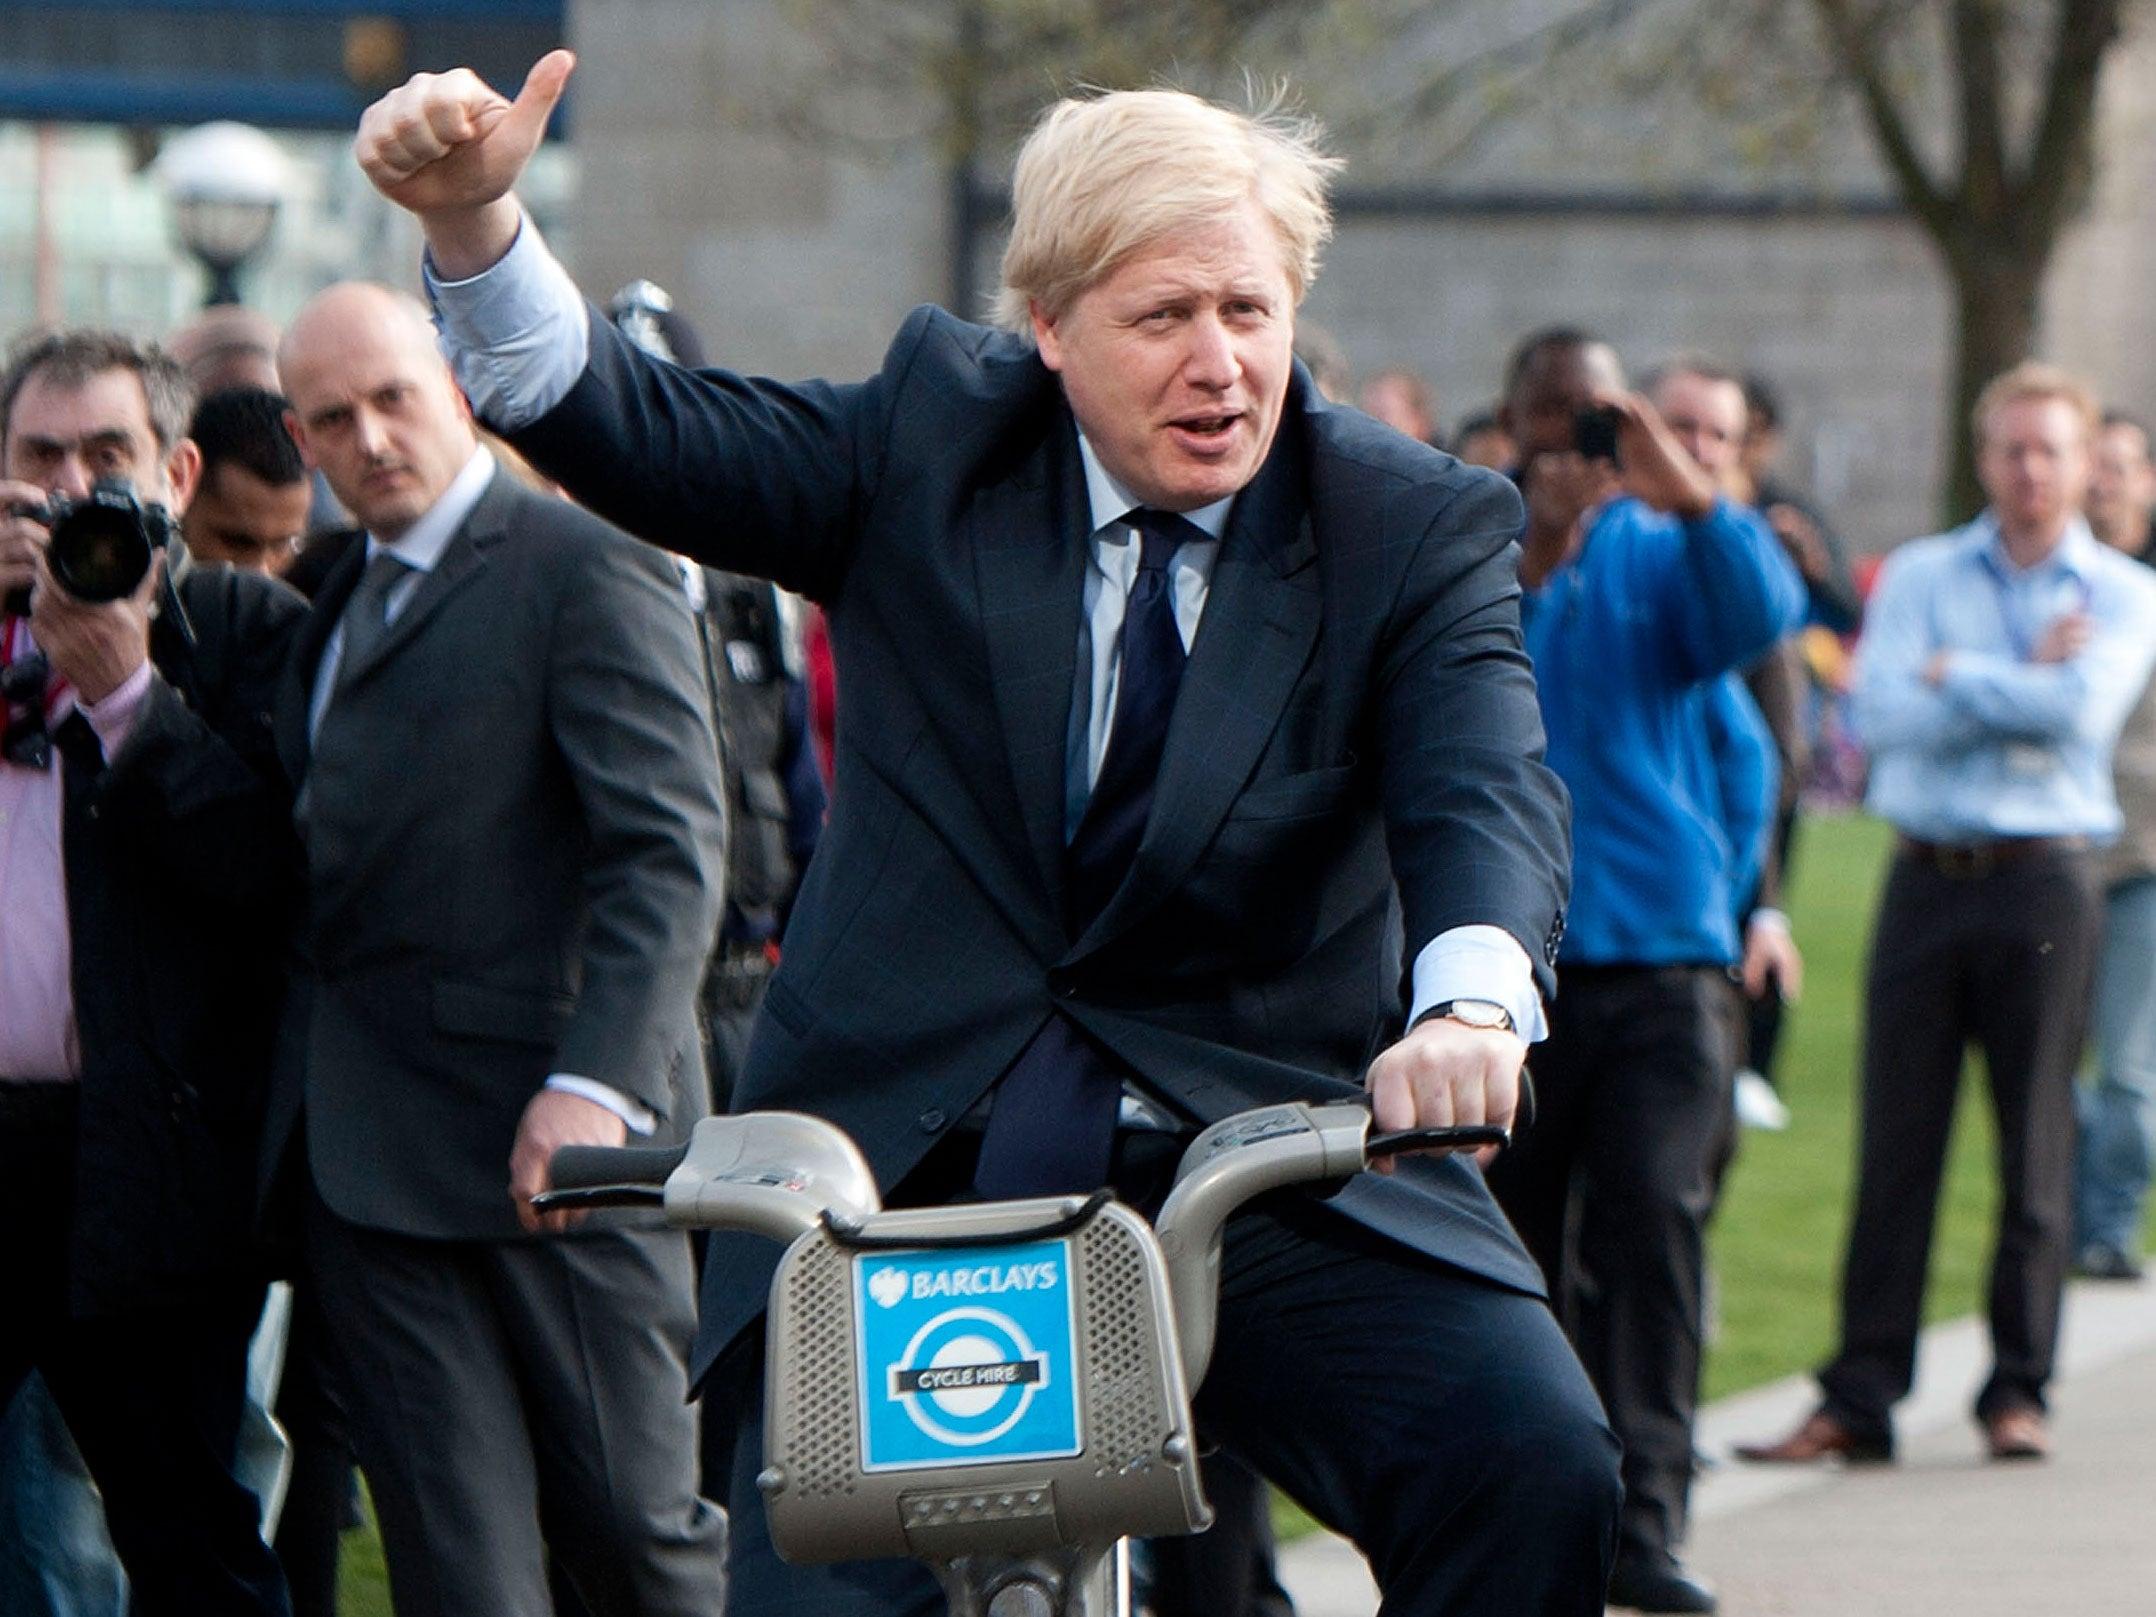 The personal life of Boris April 15